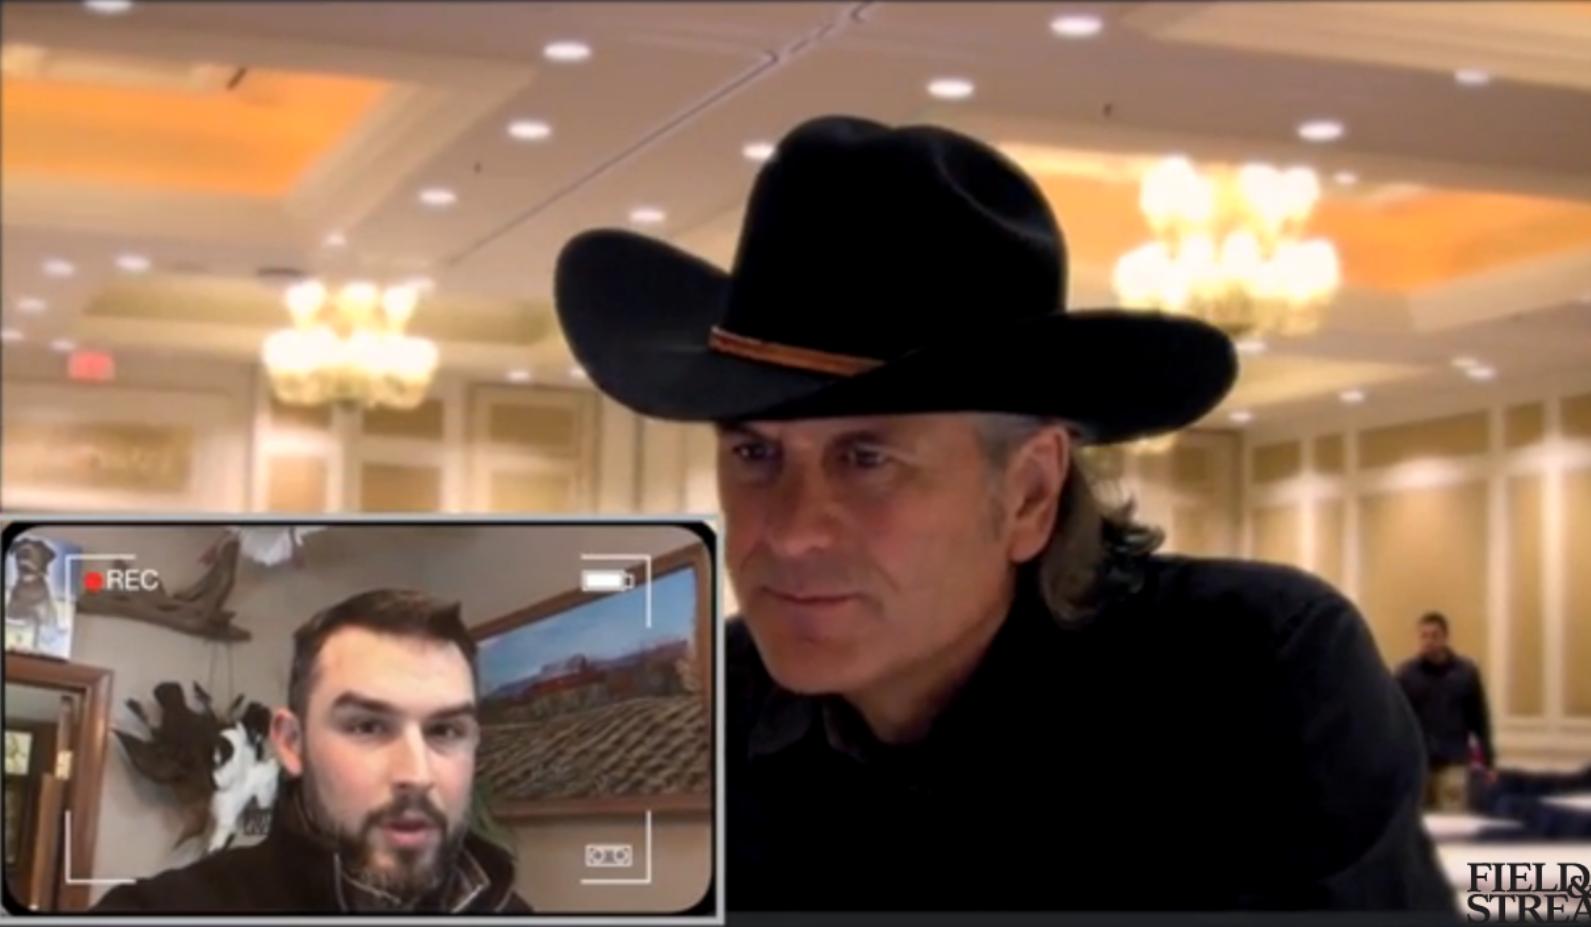 Video Q&A: Jim Shockey on Being a Badass